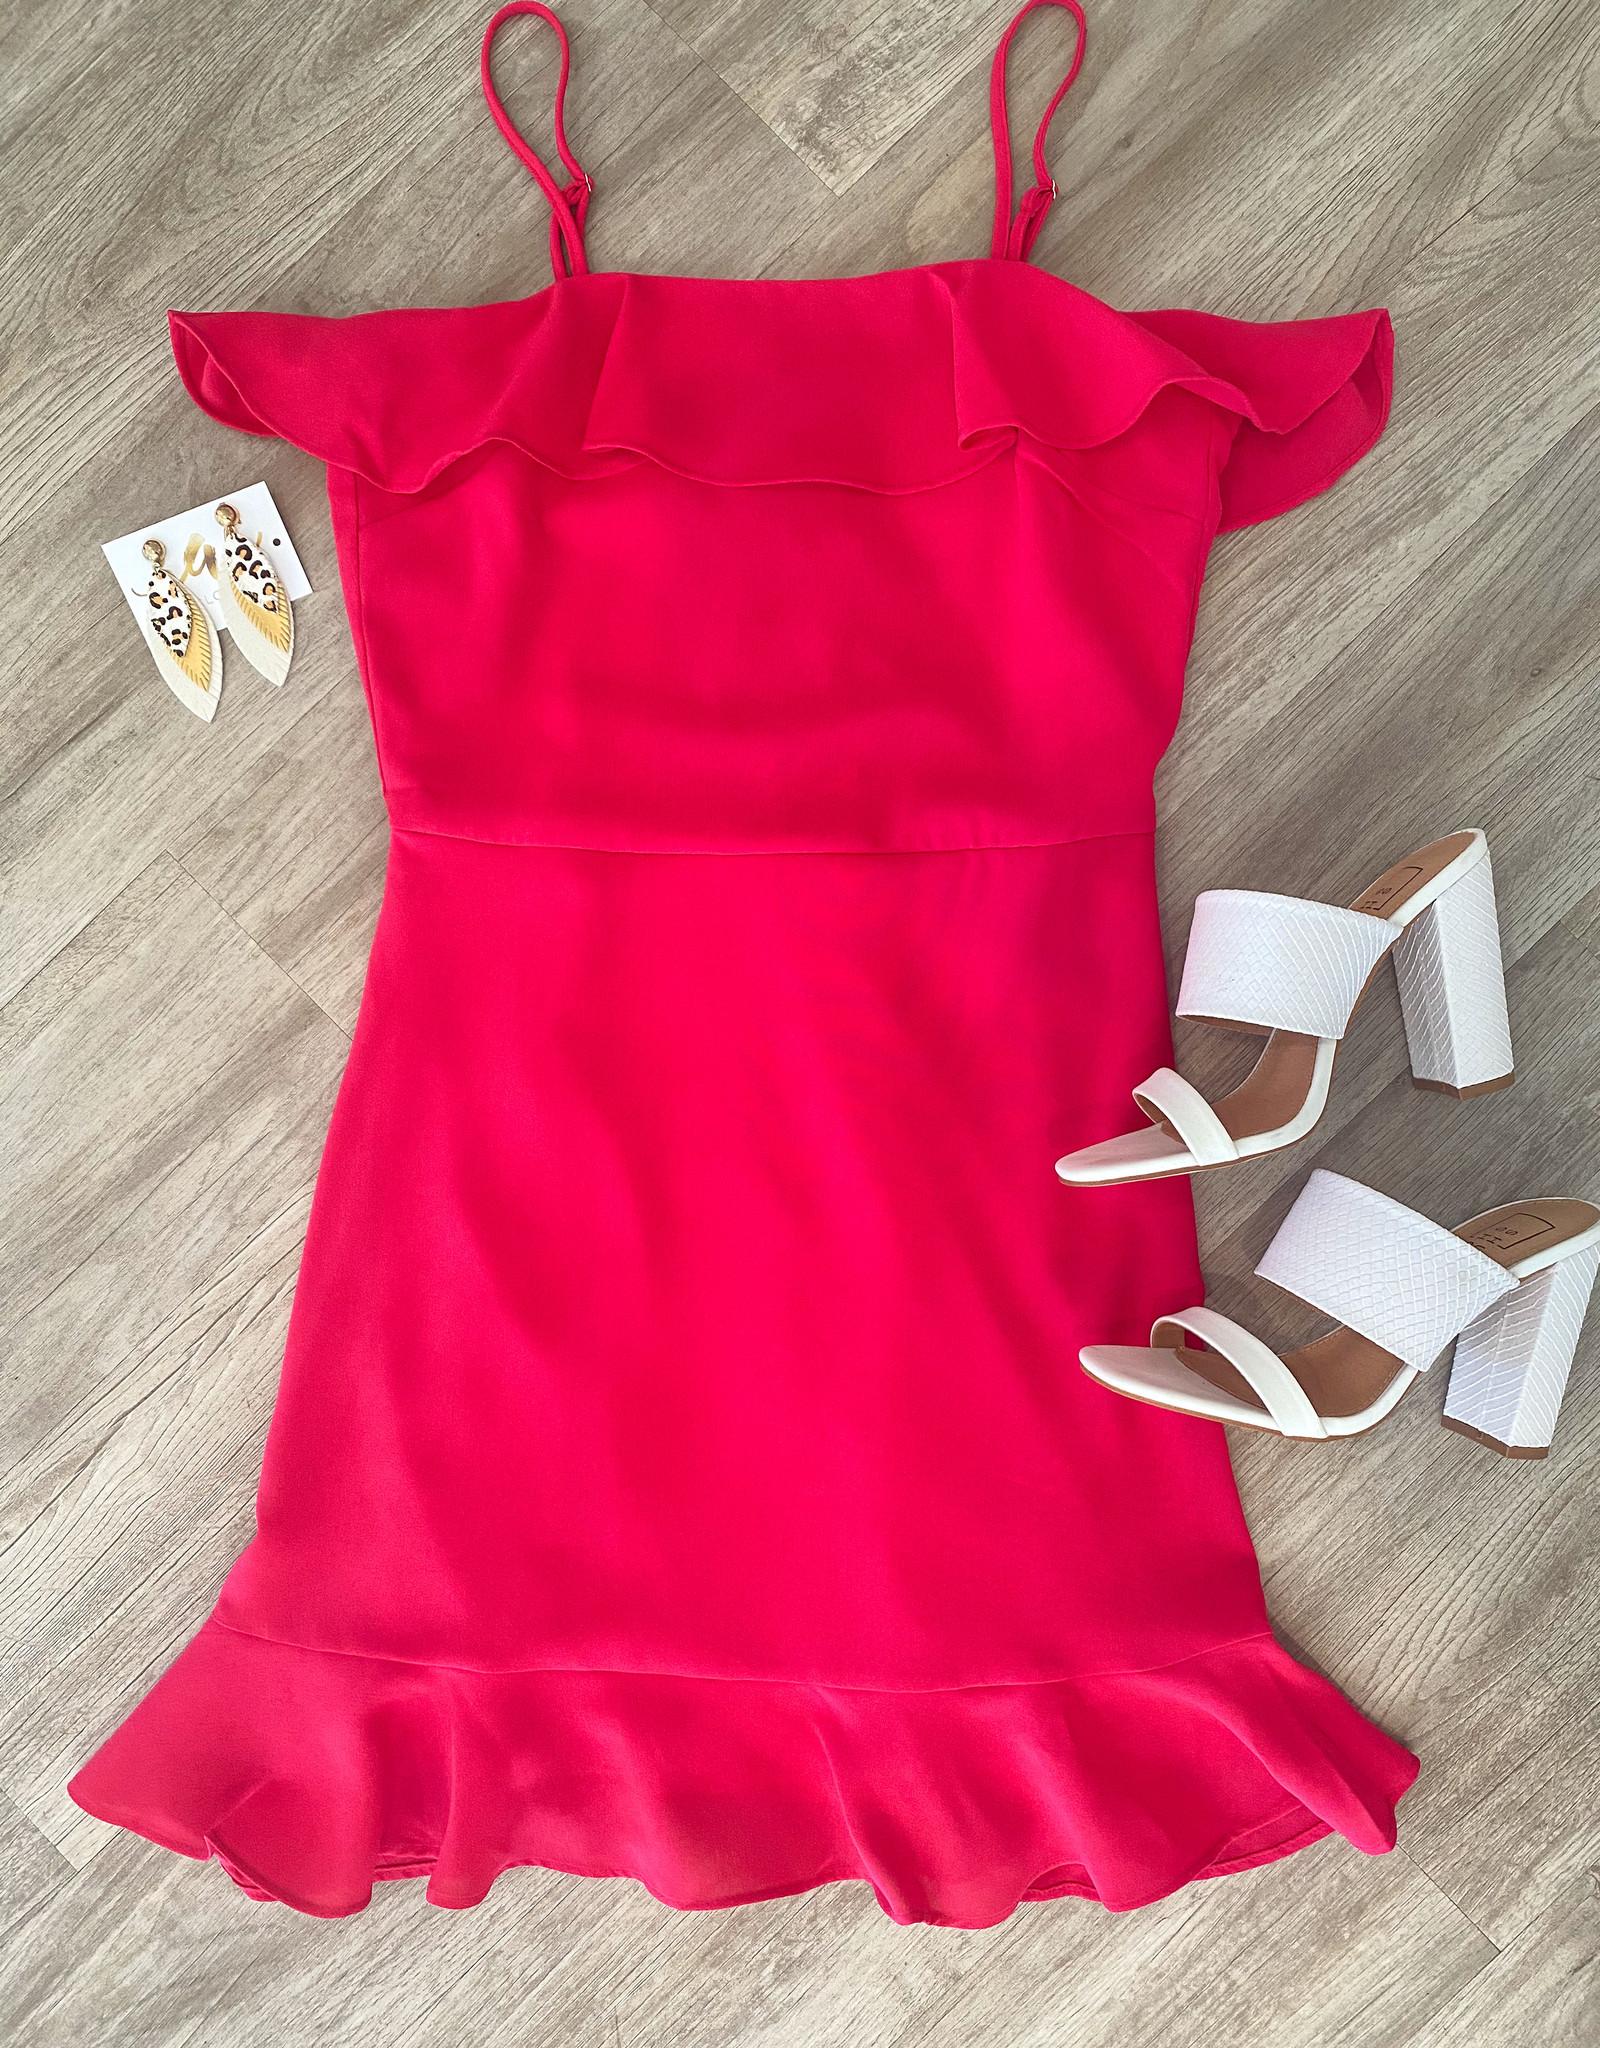 Perfectly Cherry Dress